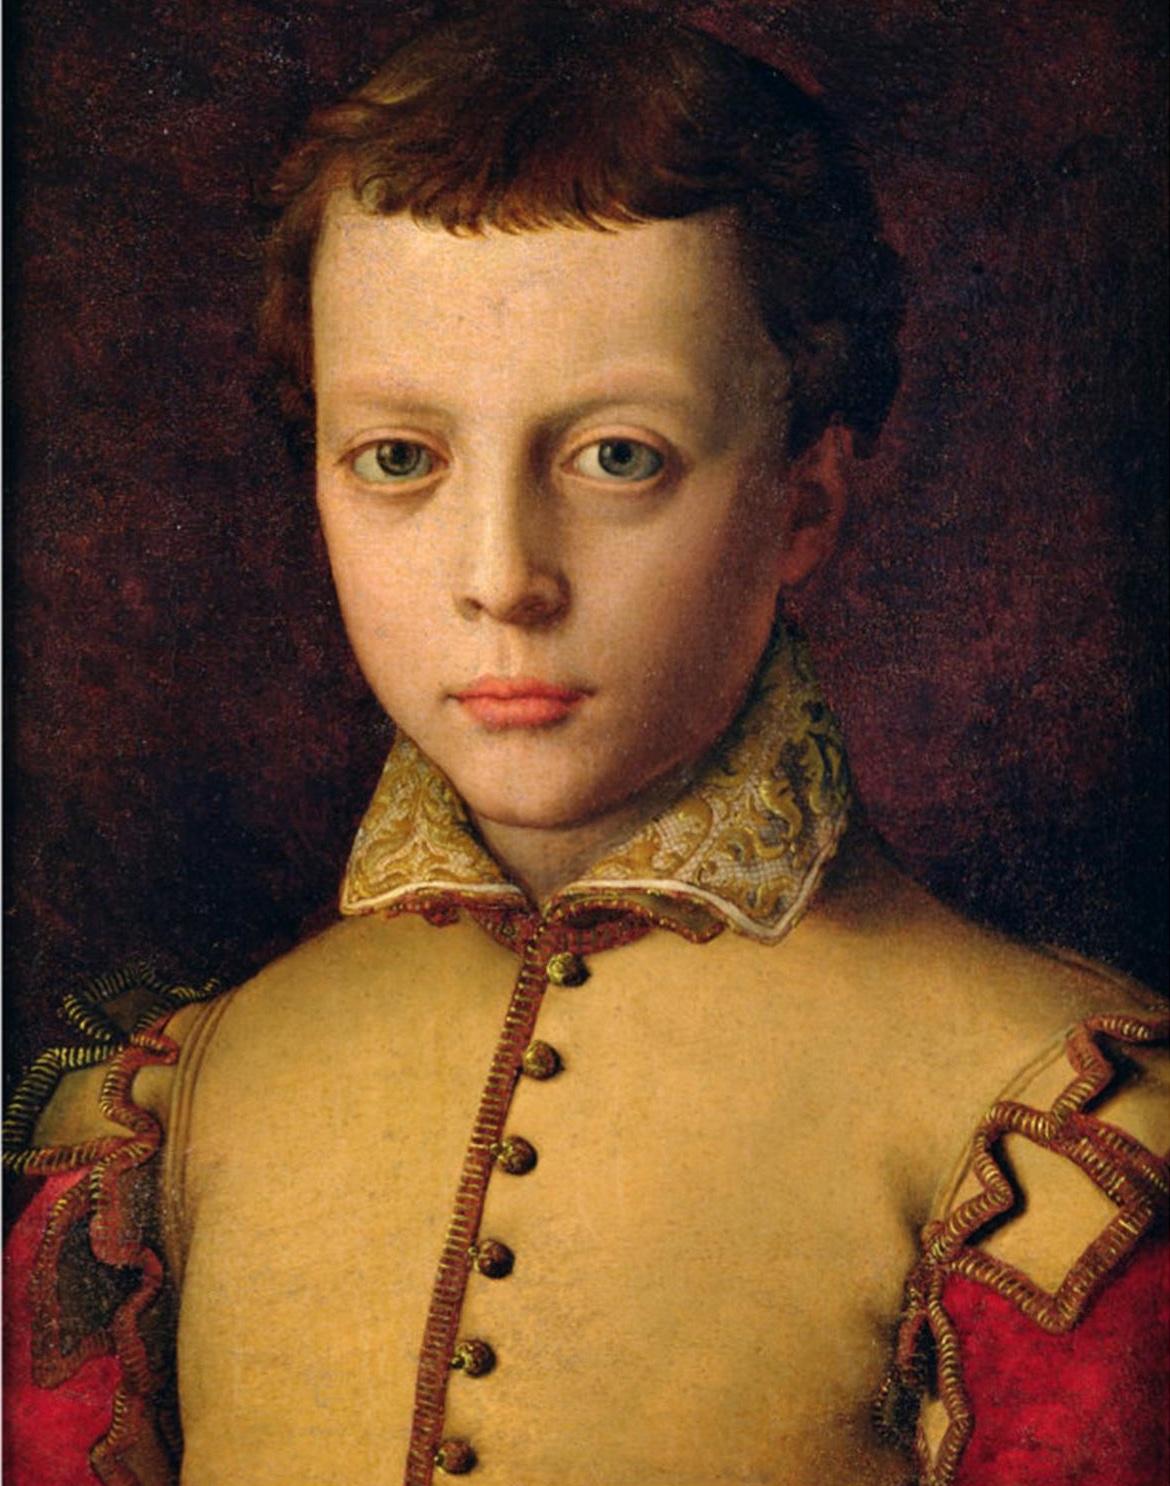 Ferdinando_I_de_medici_as_a_child_Agnolo_Bronzino.jpg